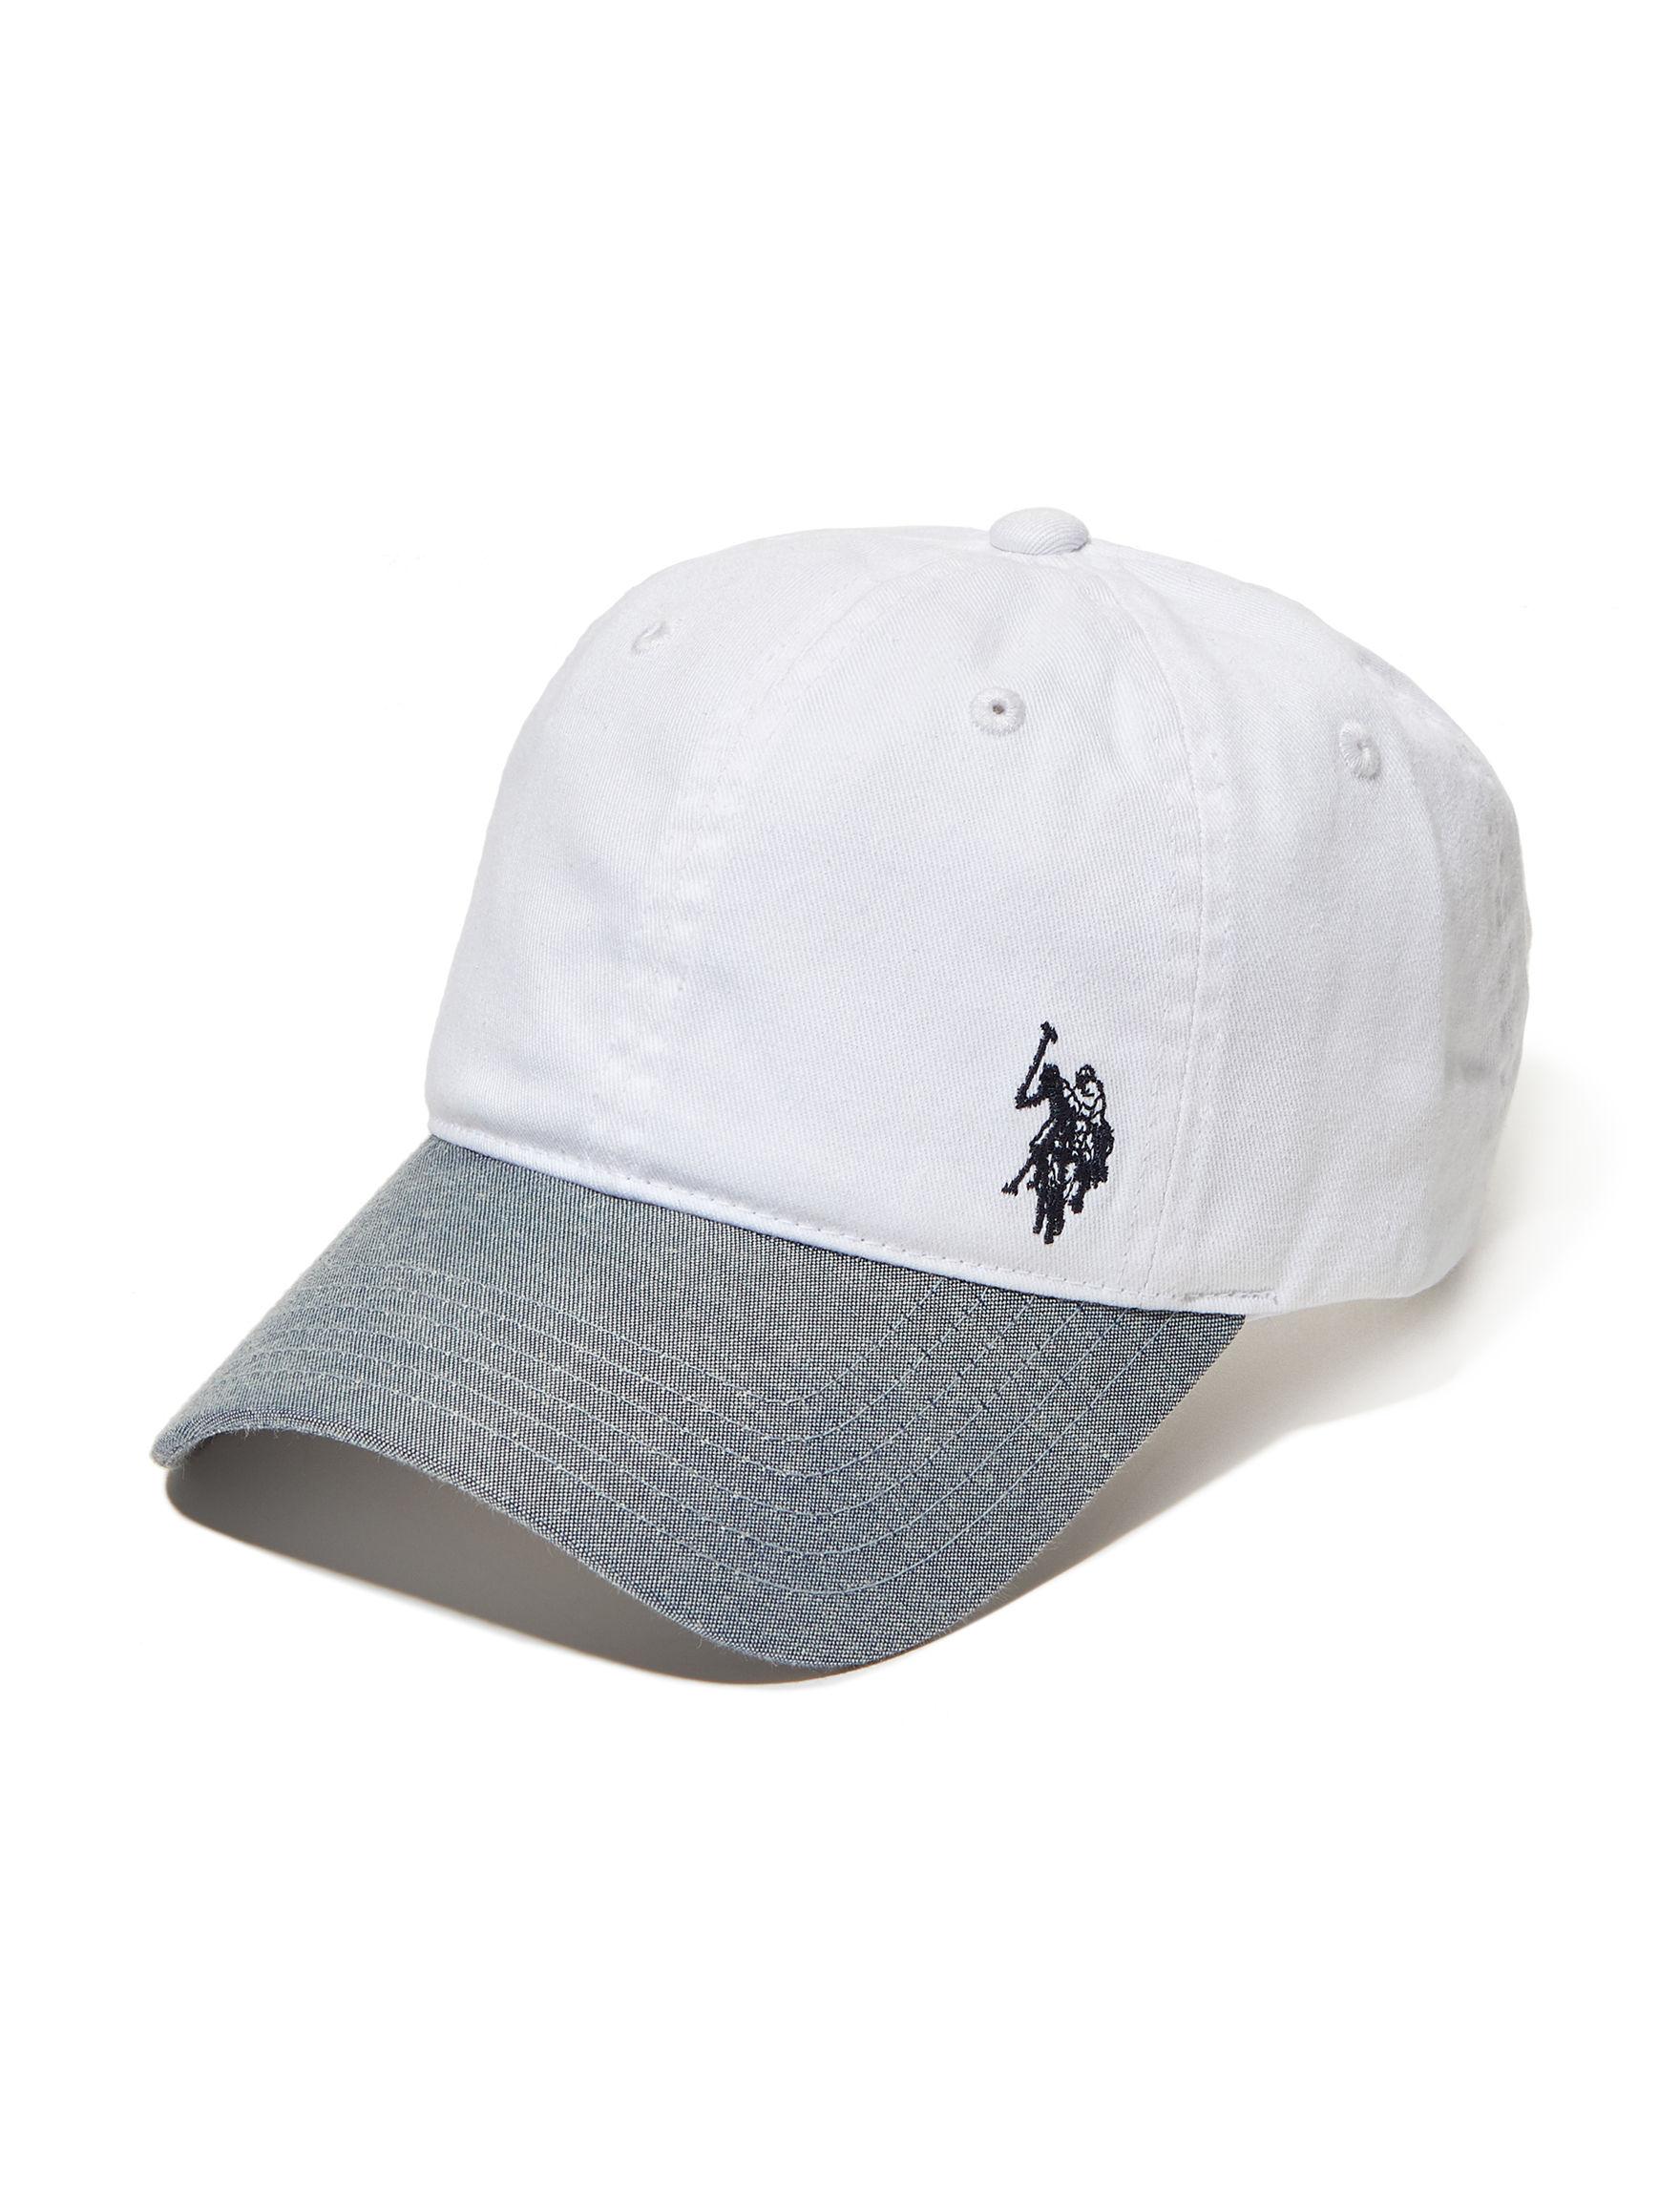 U.S. Polo Assn. White / Navy Hats & Headwear